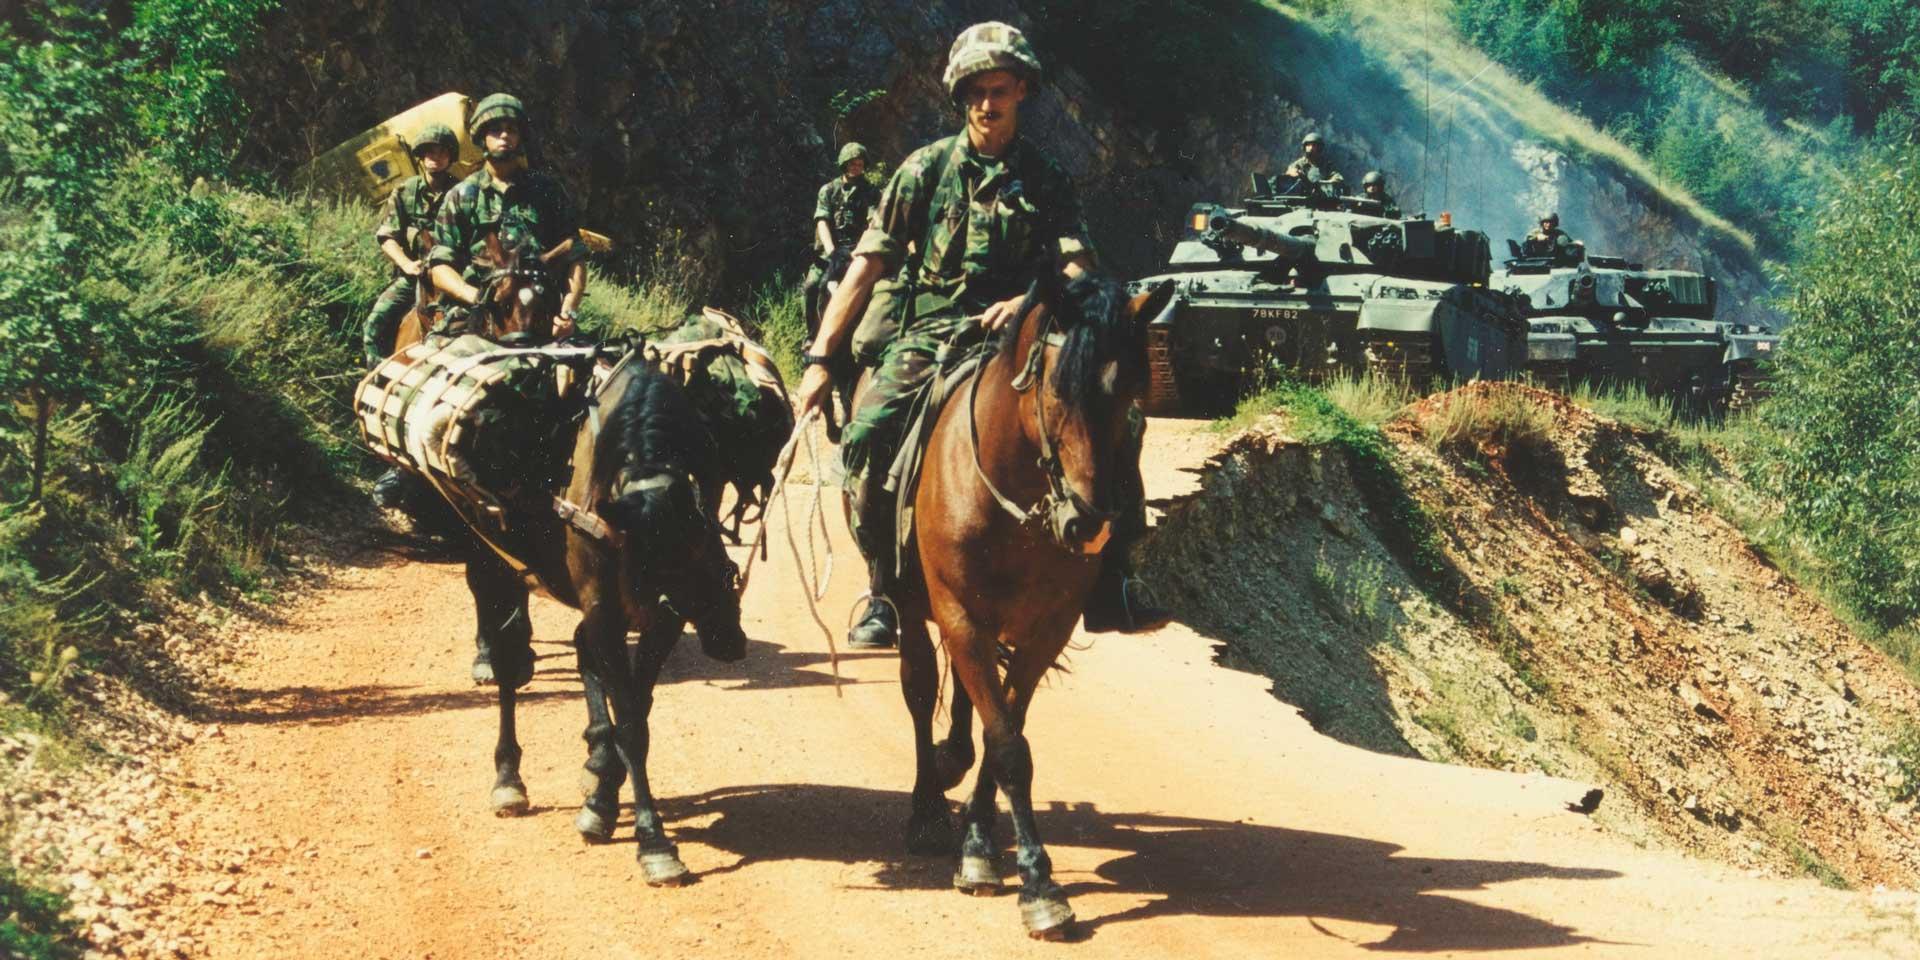 King's Royal Hussars on mounted patrol alongside their Challenger tanks, Mrkonjic Grad, Bosnia, 1997